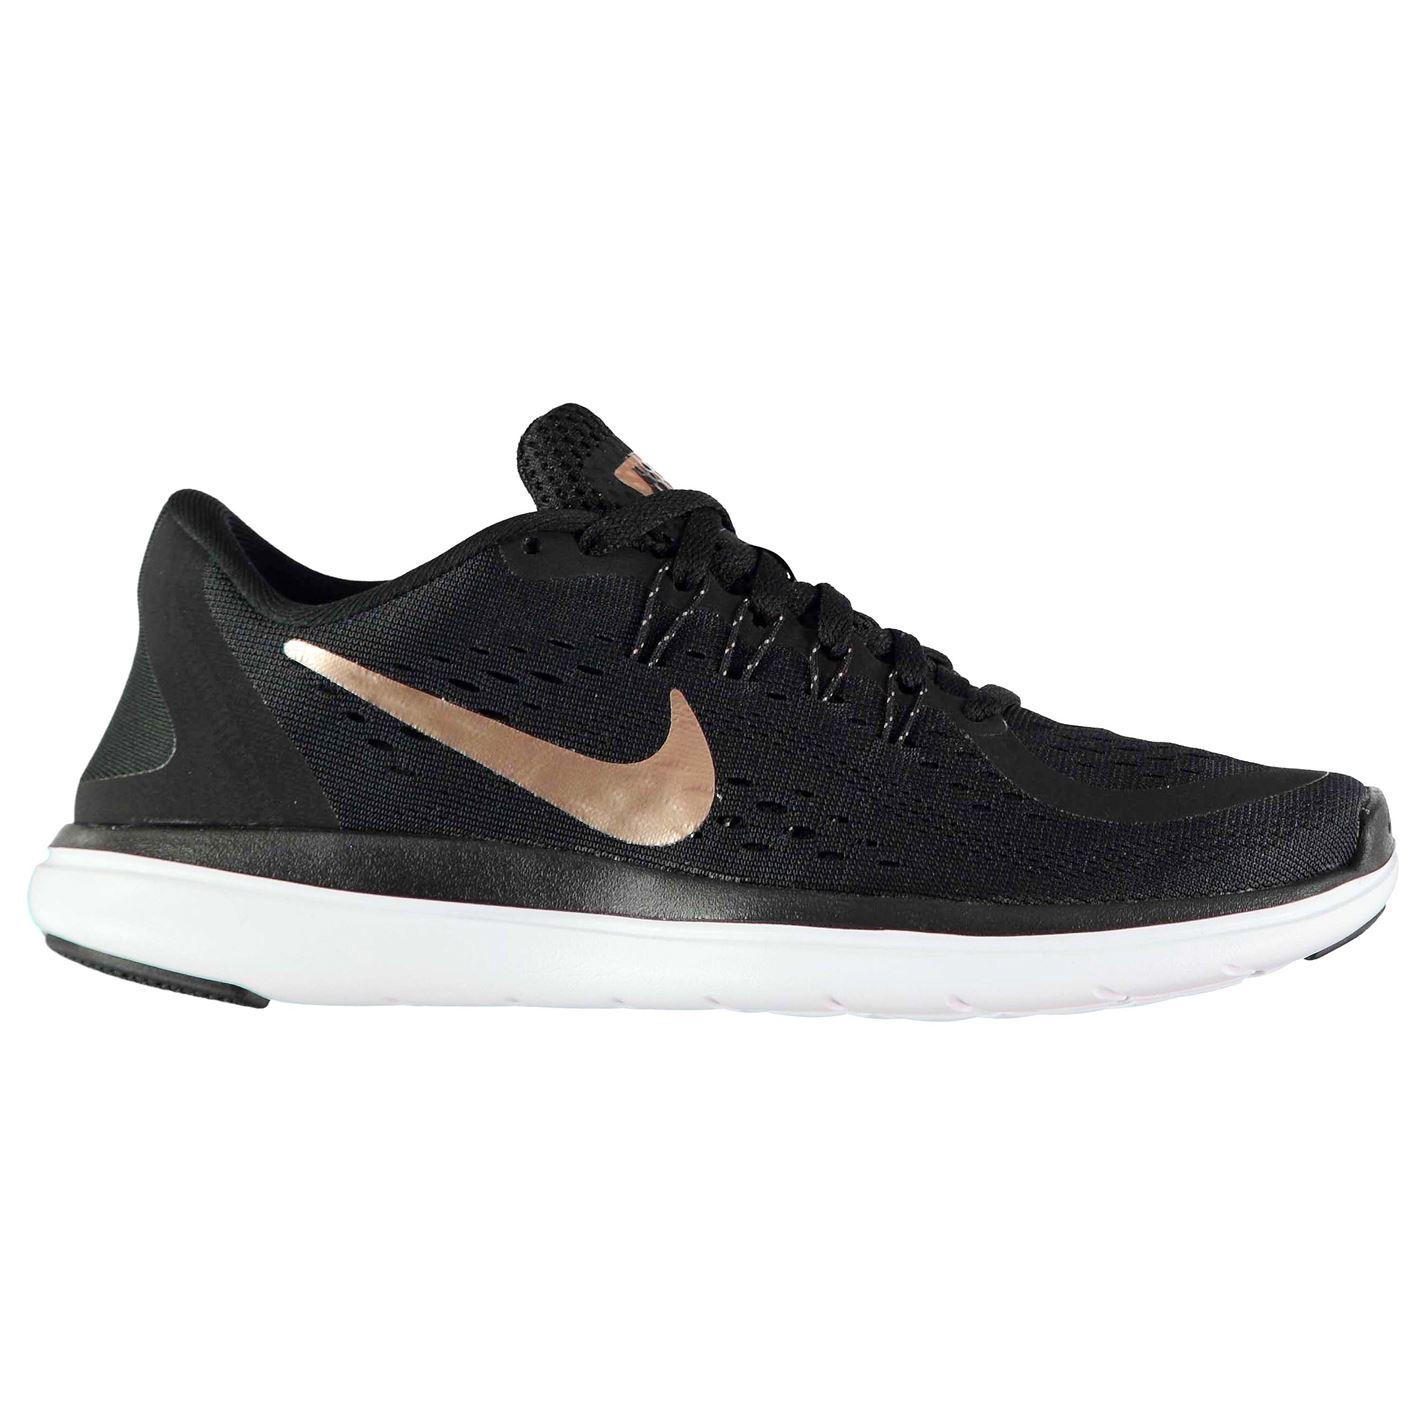 Nike Flex 2017 Running Trainers Ladies